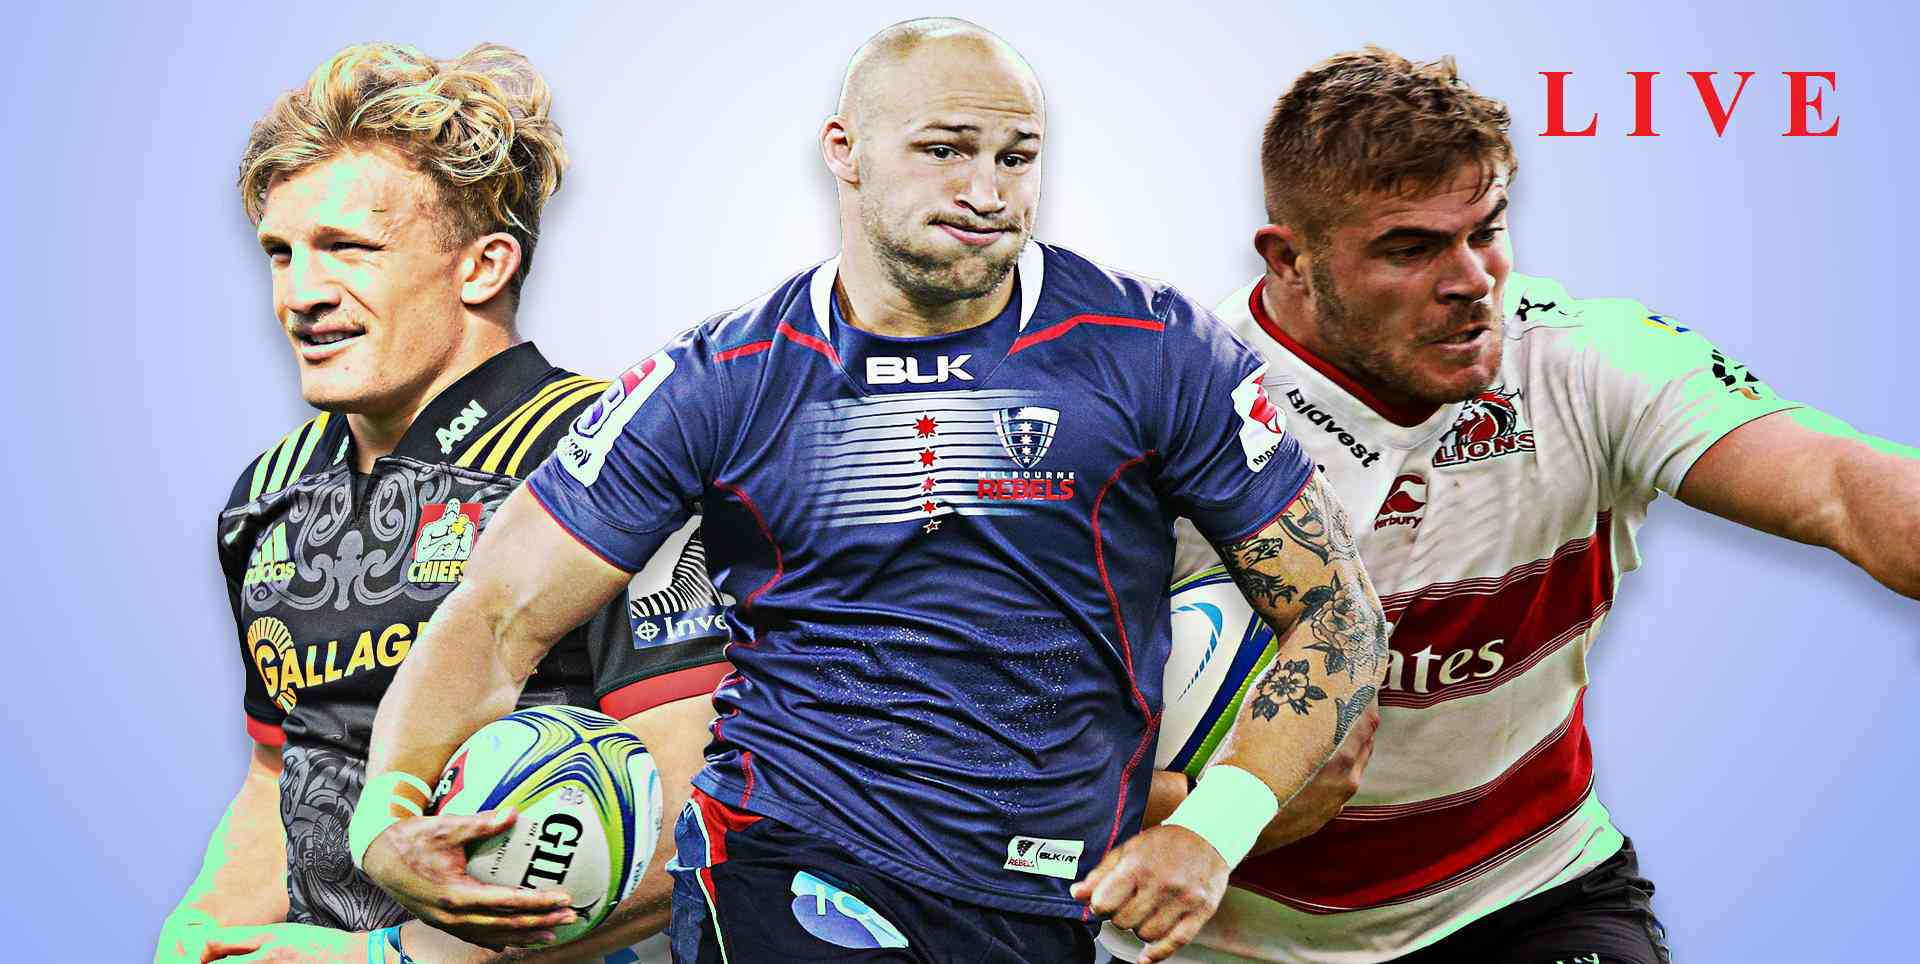 british-&-irish-lions-vs-highlanders-rugby-live